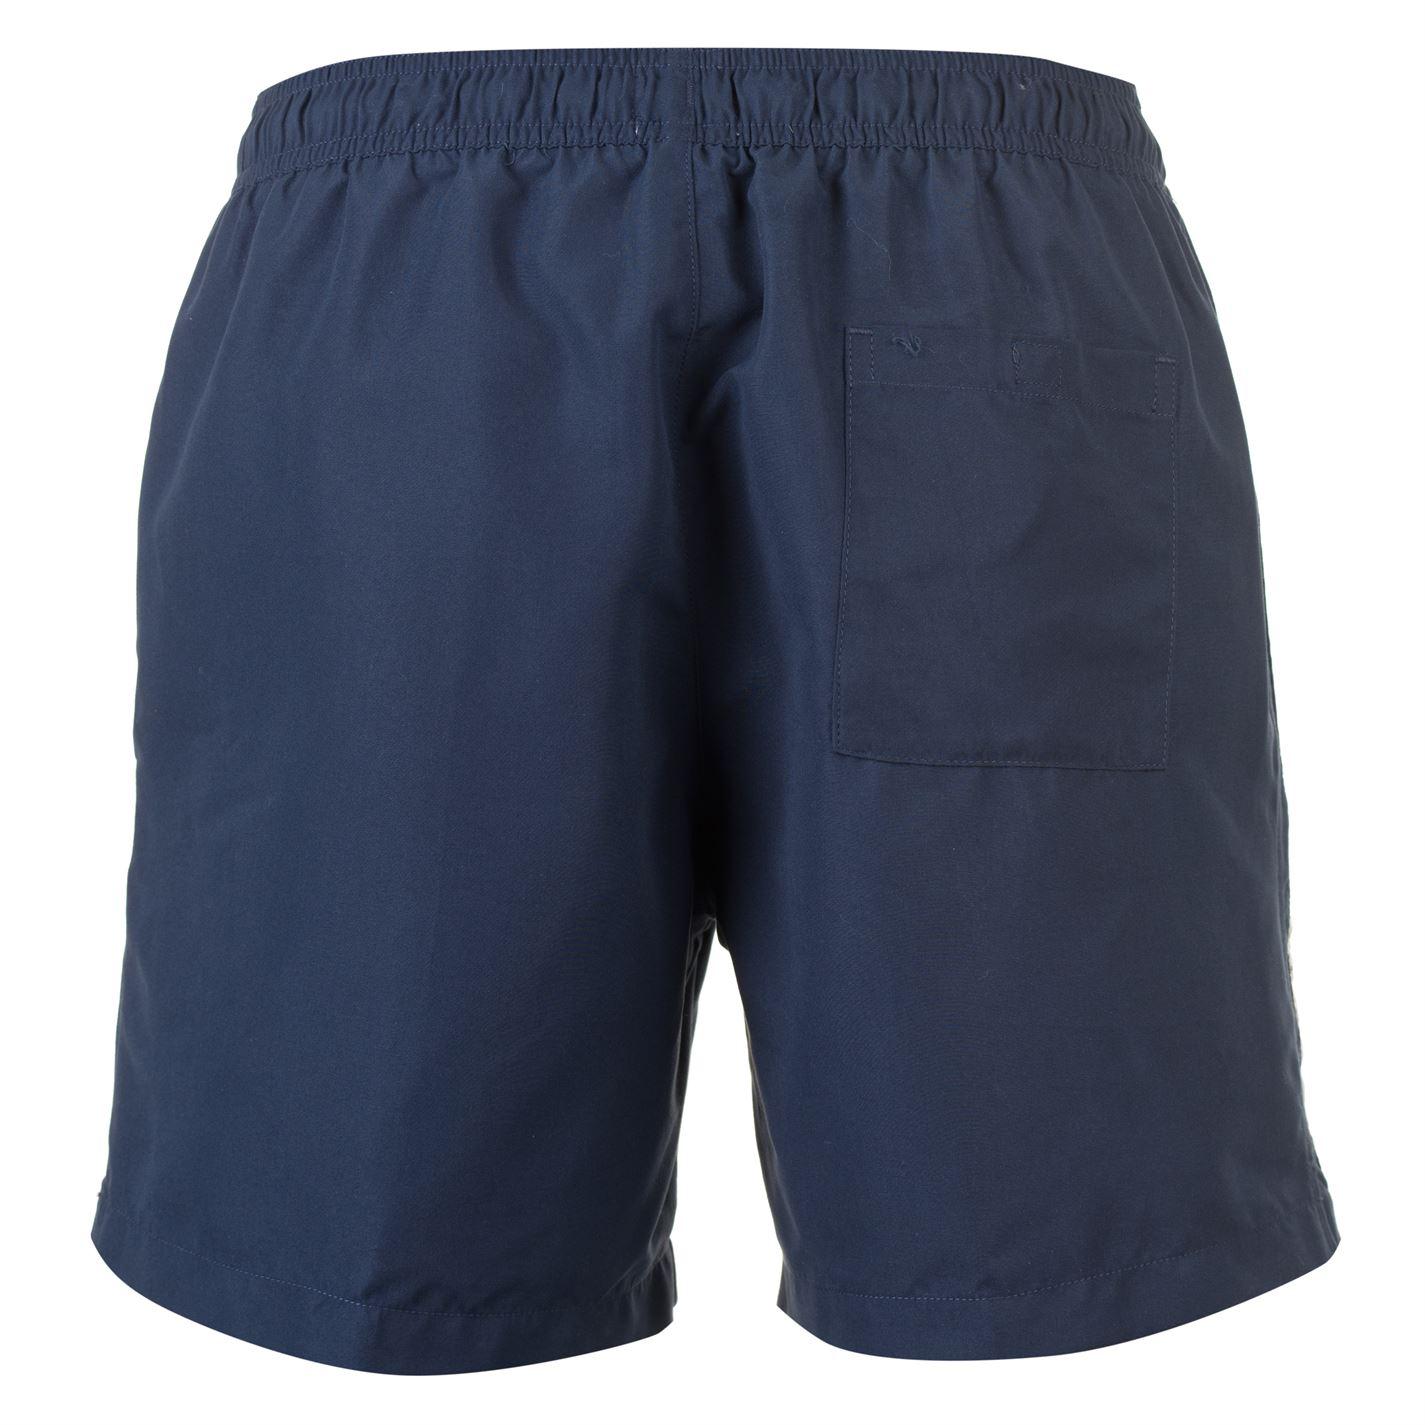 31b6a2a37f1 Calvin Klein Taped Drawstring Swim Shorts Mens Gents Pants Trousers ...